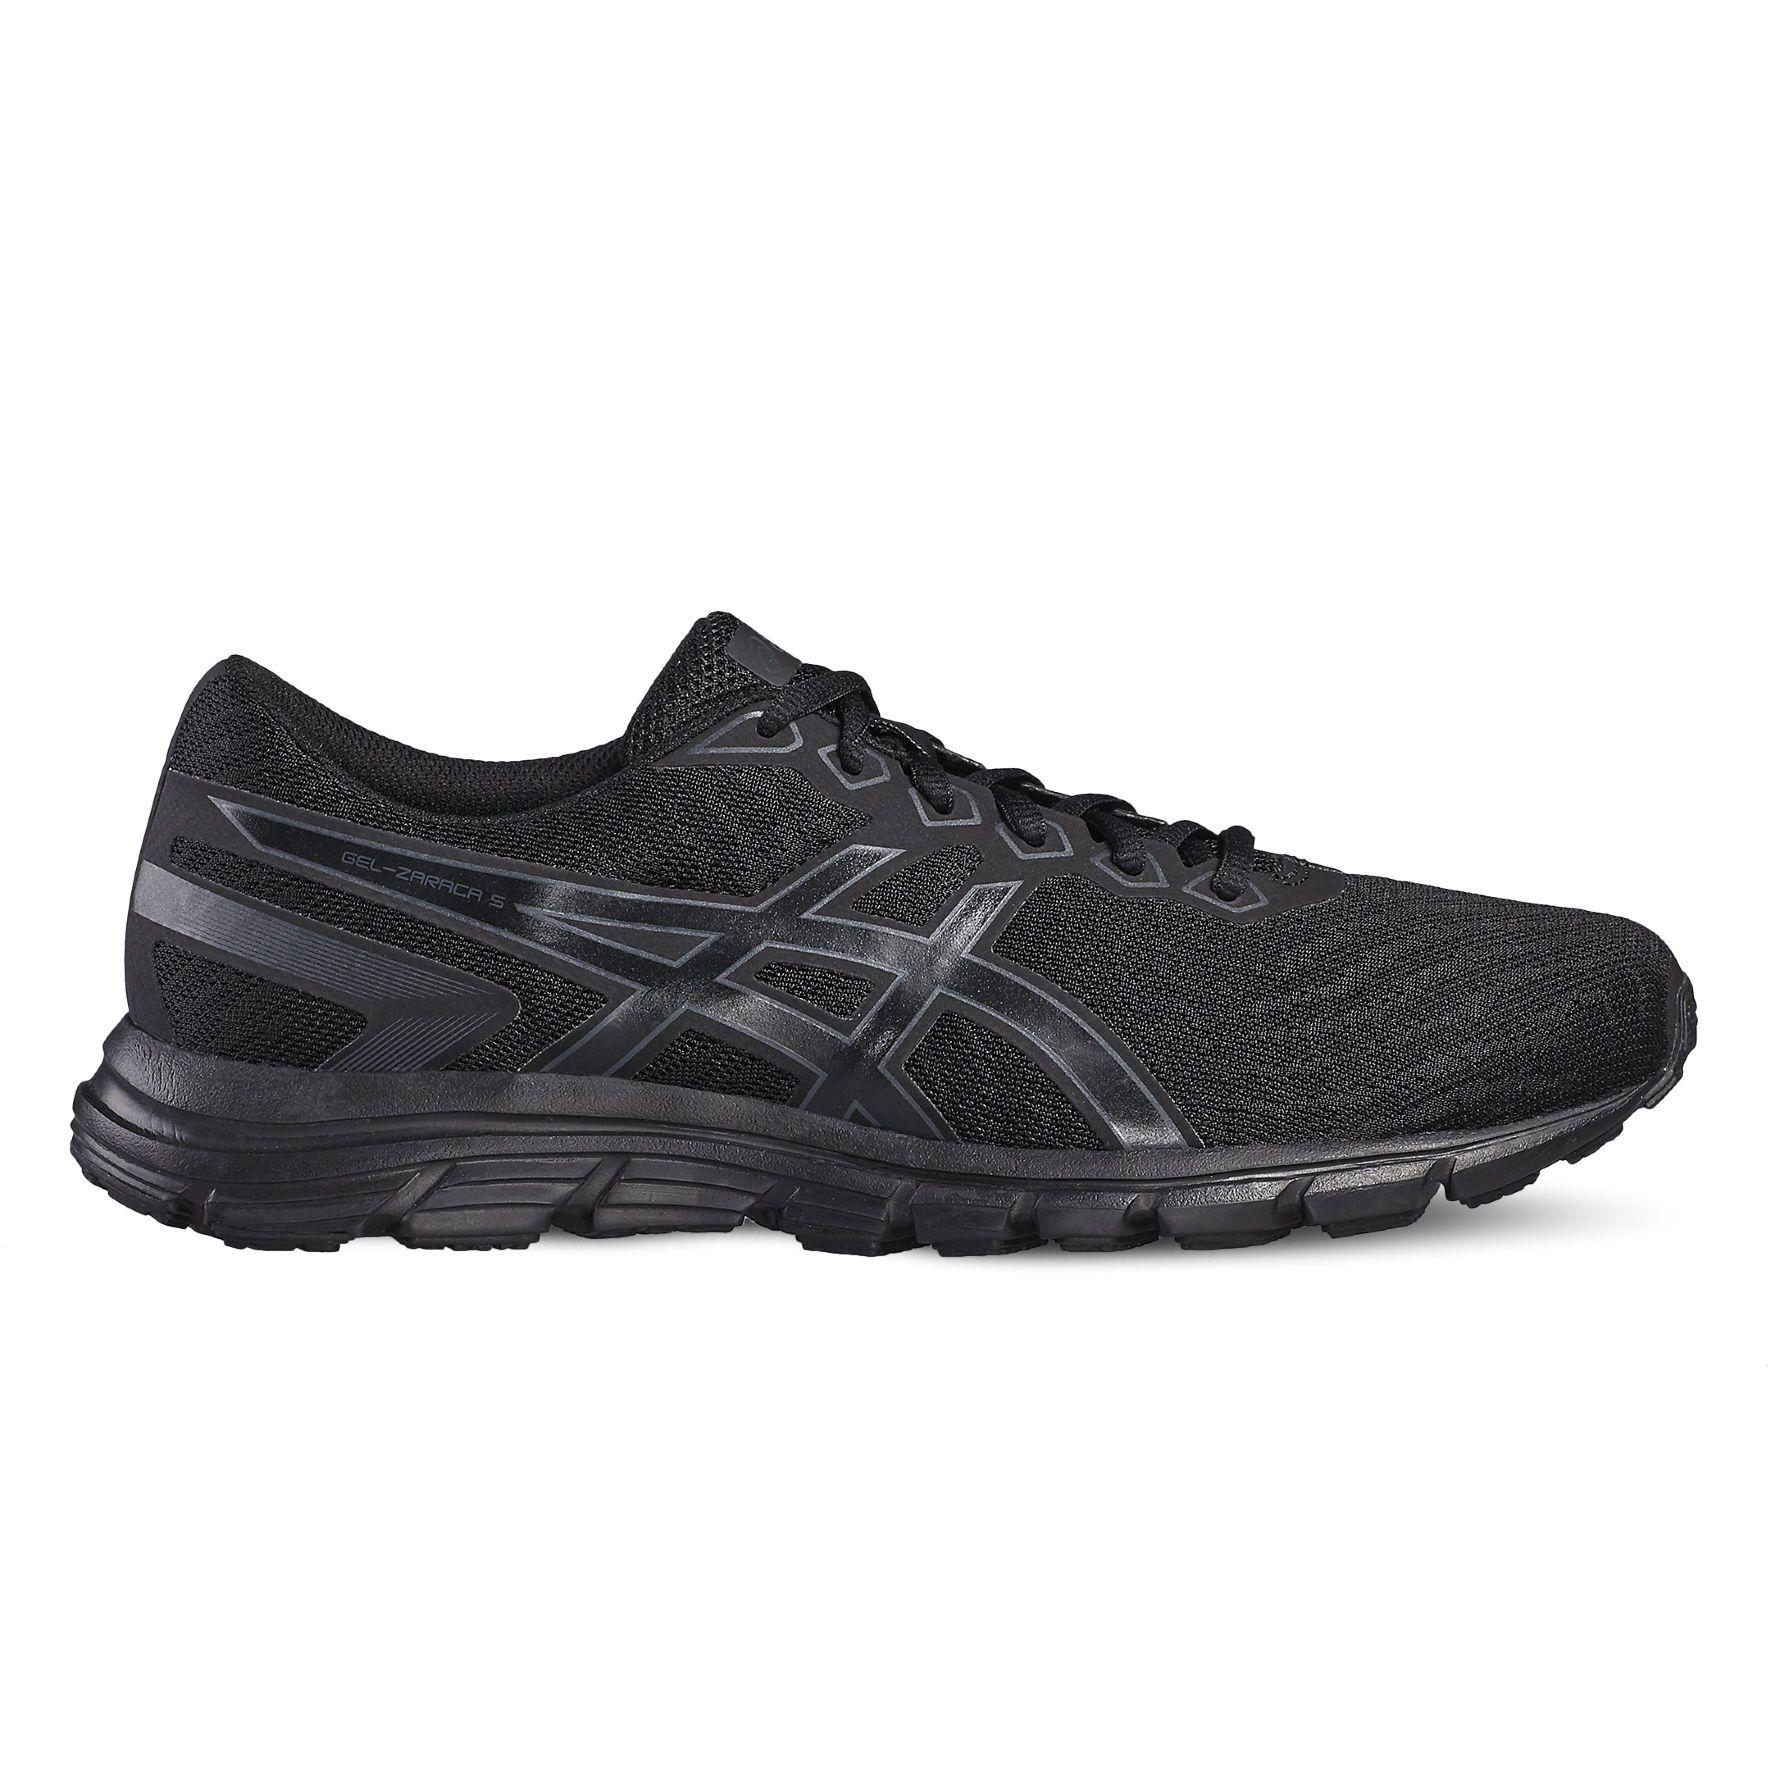 Спортивная обувь ASICS T6G3N 9095 GEL-ZARACA 5